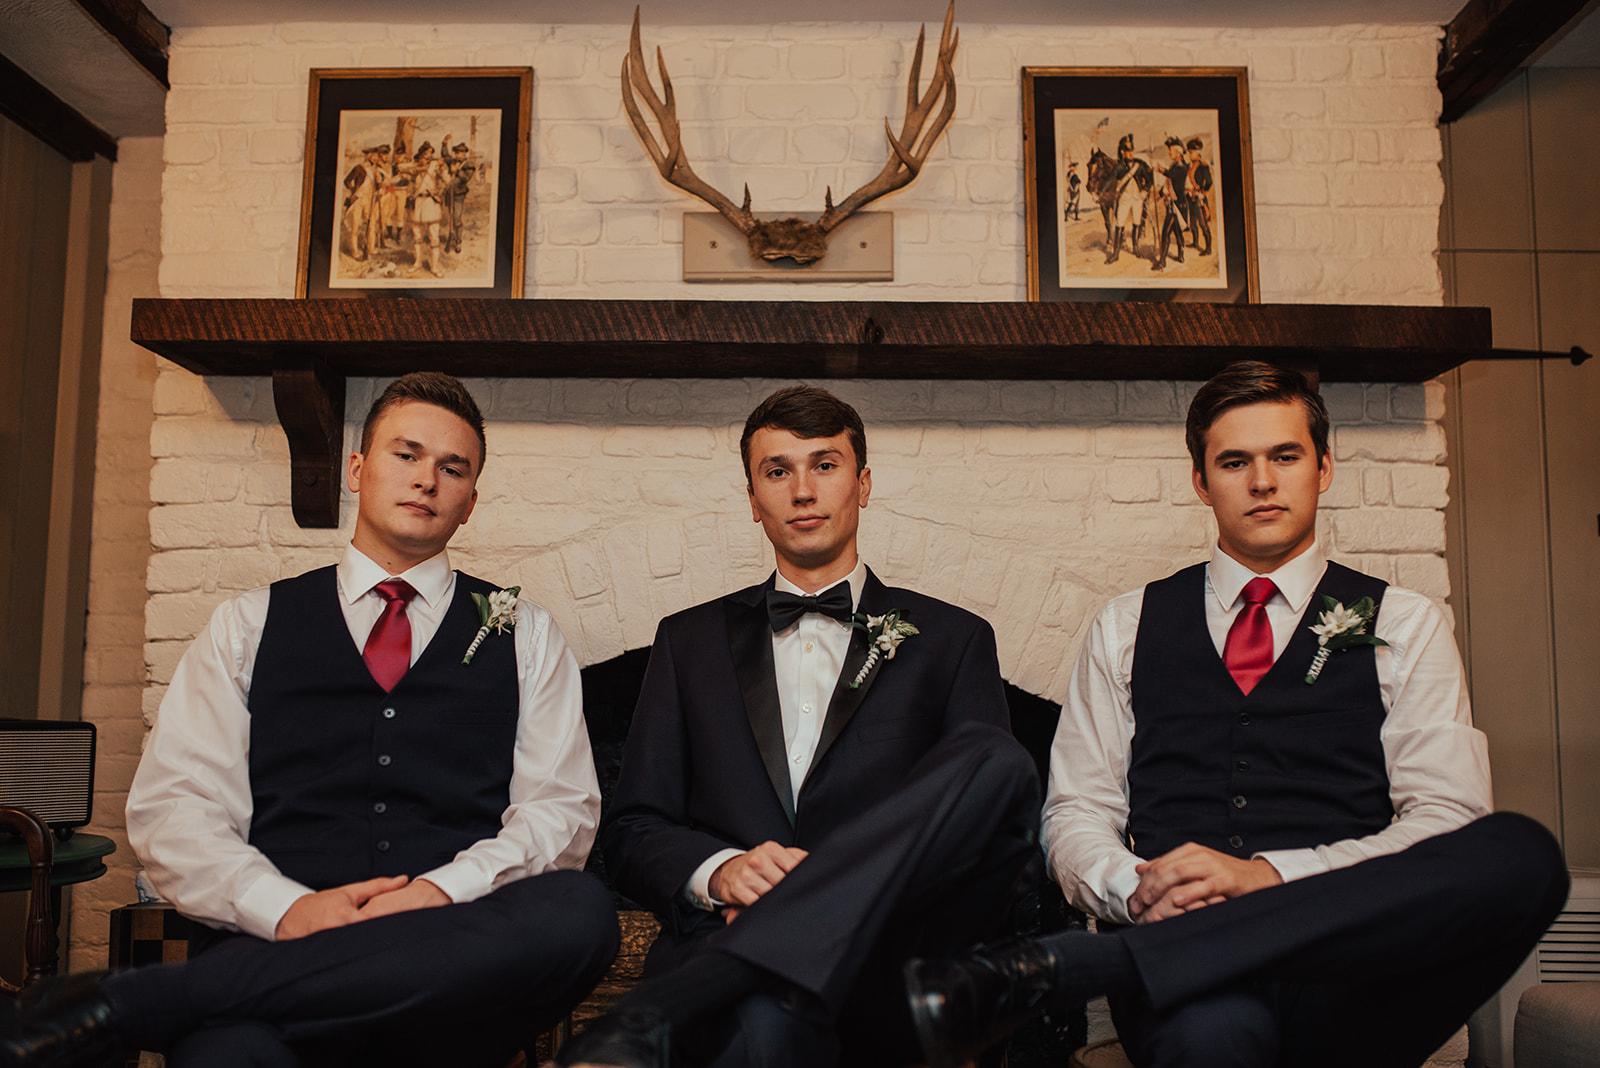 Richmond Wedding By SB Photographs112112112112.jpg